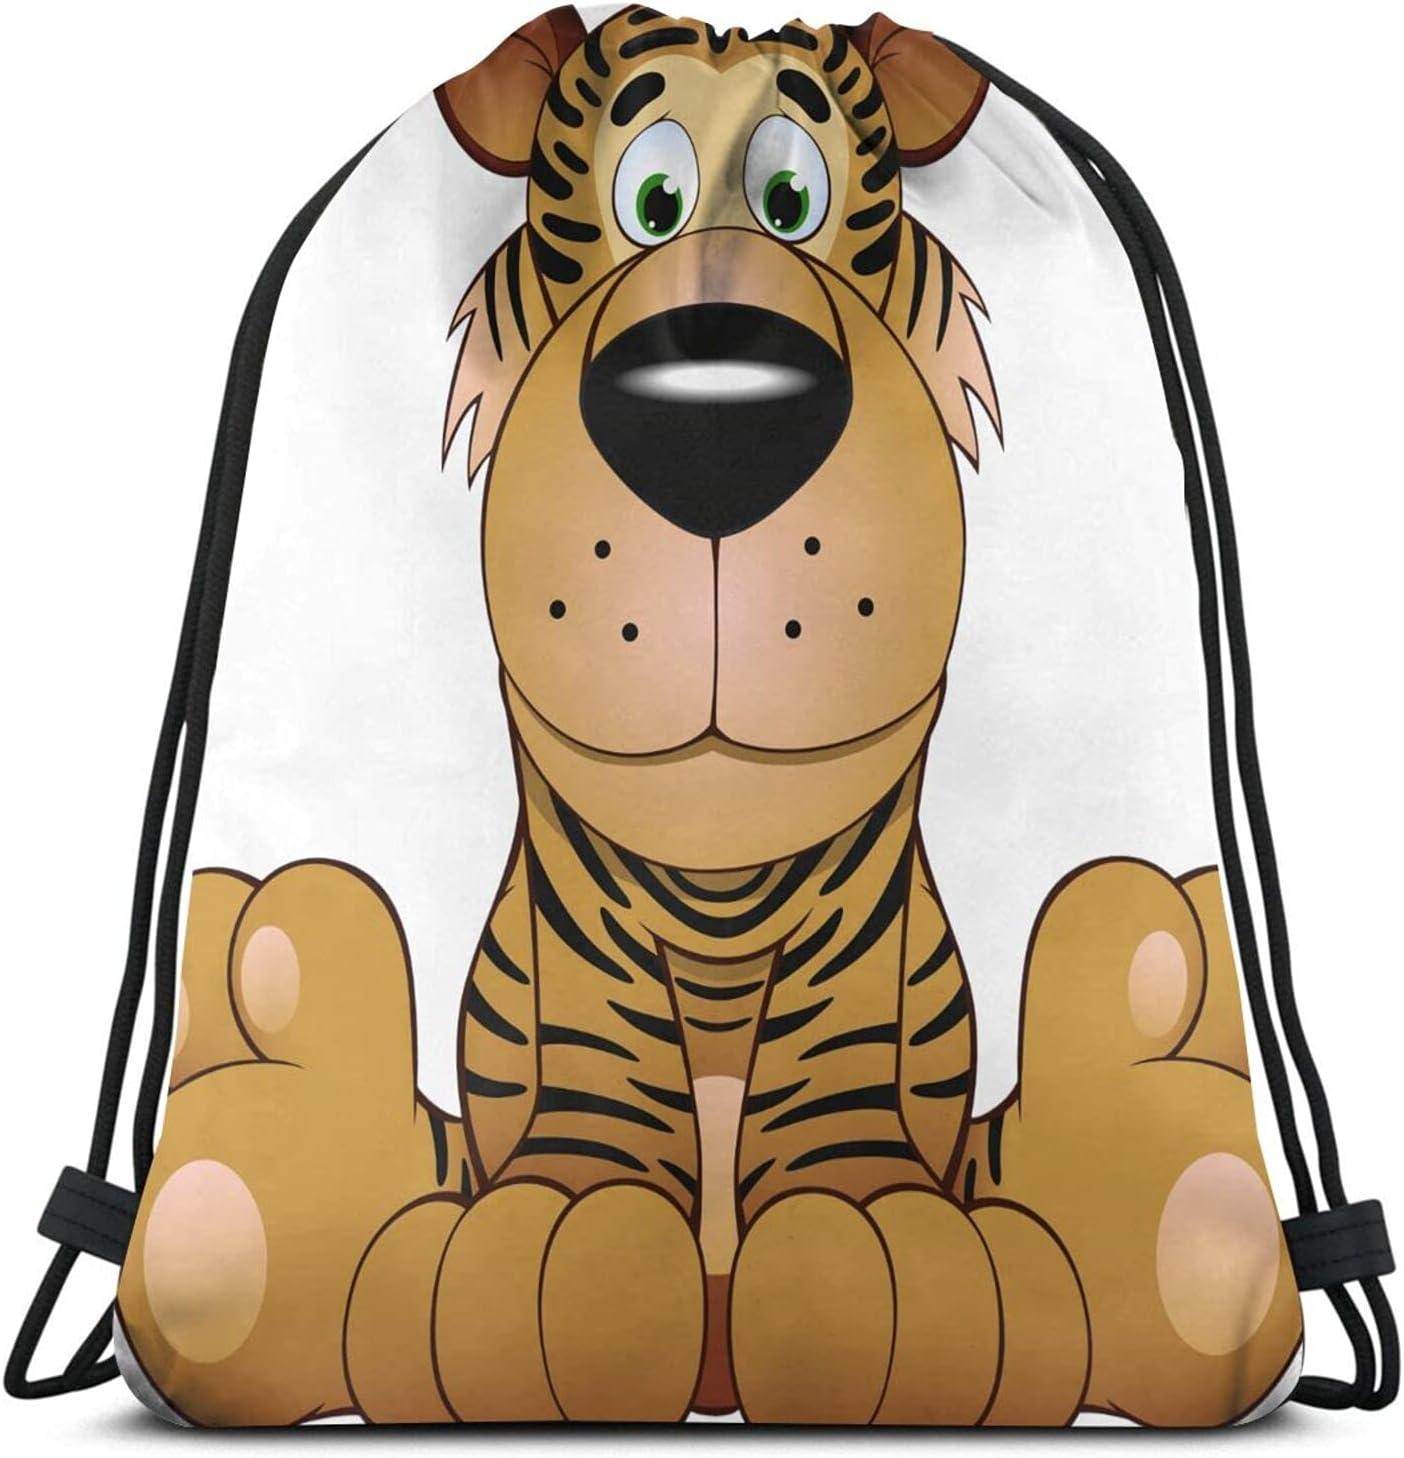 Aggrieved Cartoon Tiger Drawstring Backpack Popular brand Sports Charlotte Mall Bag Yoga Gym